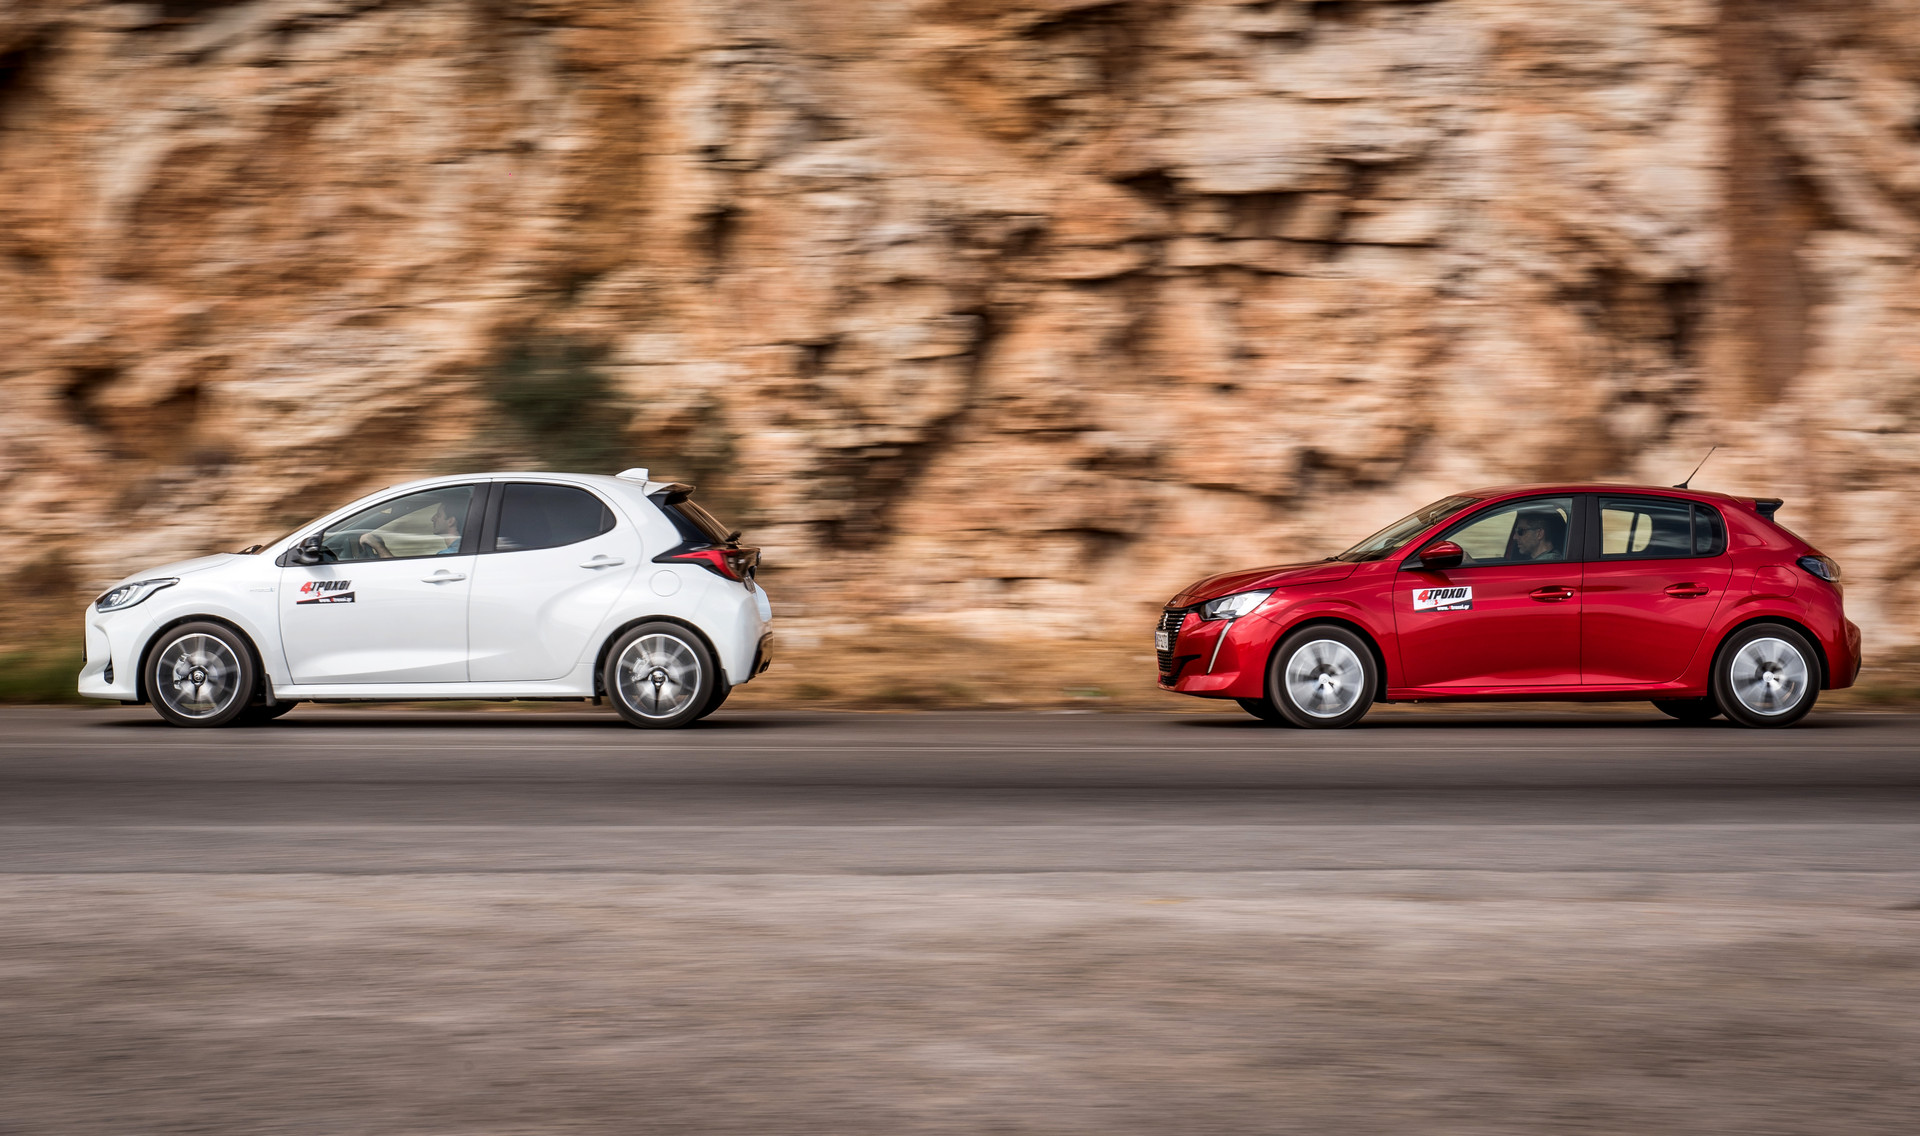 Toyota Yaris 1.5 Hybrid – Peugeot 208 1.2 PureTech 100 EAT8